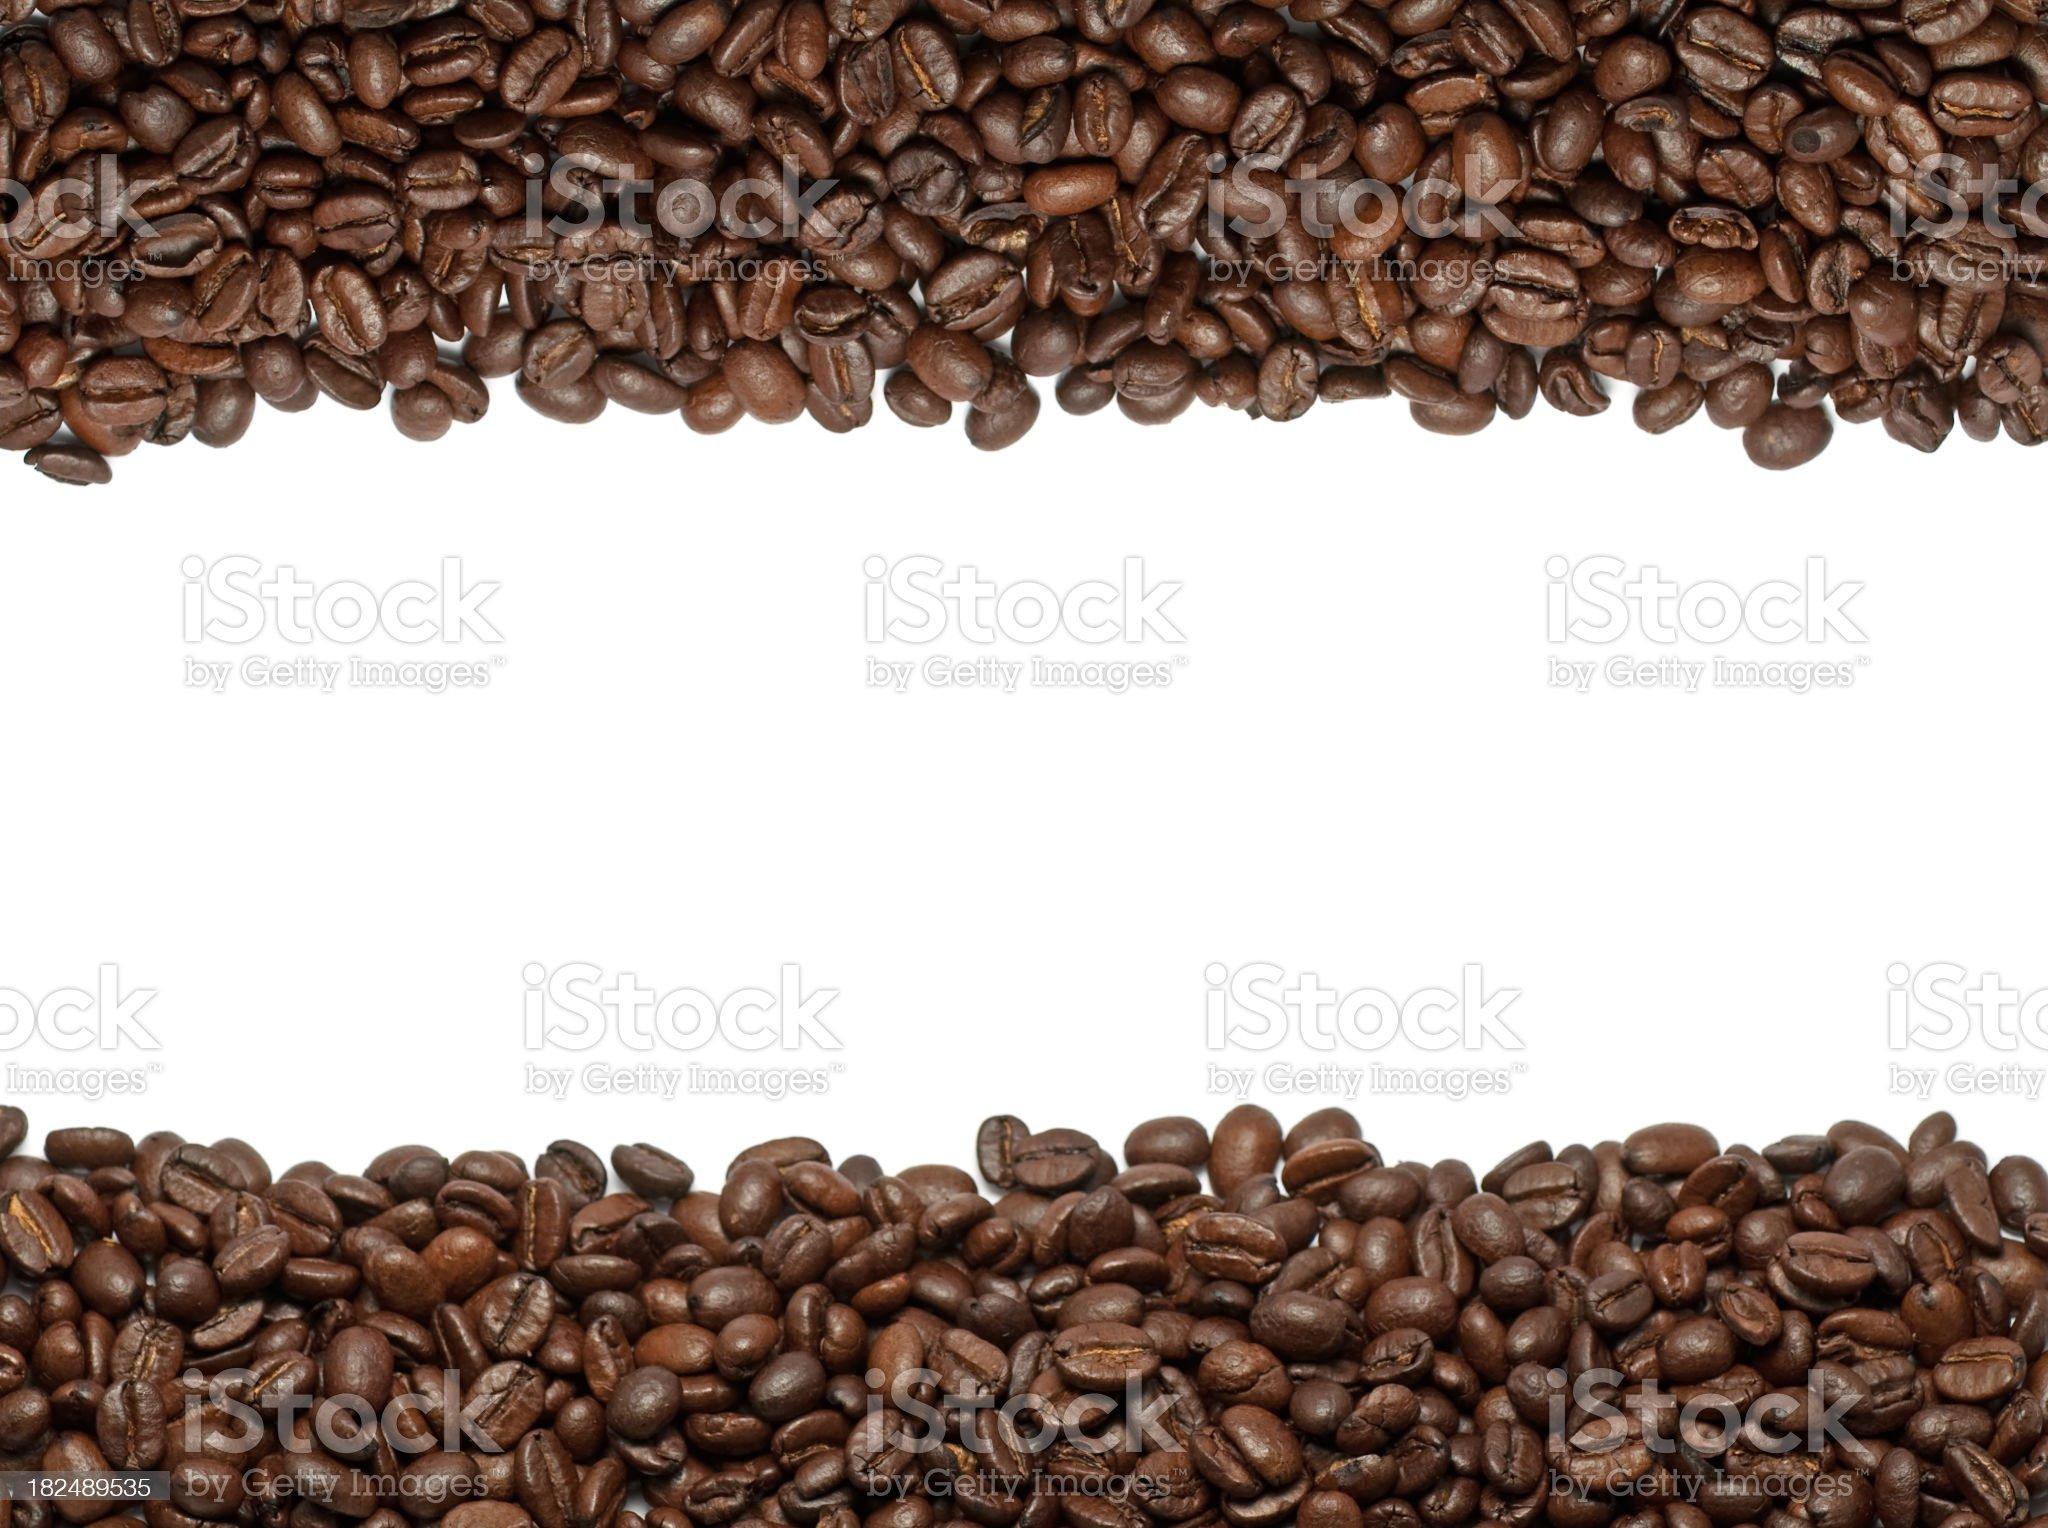 Coffee beans border. royalty-free stock photo